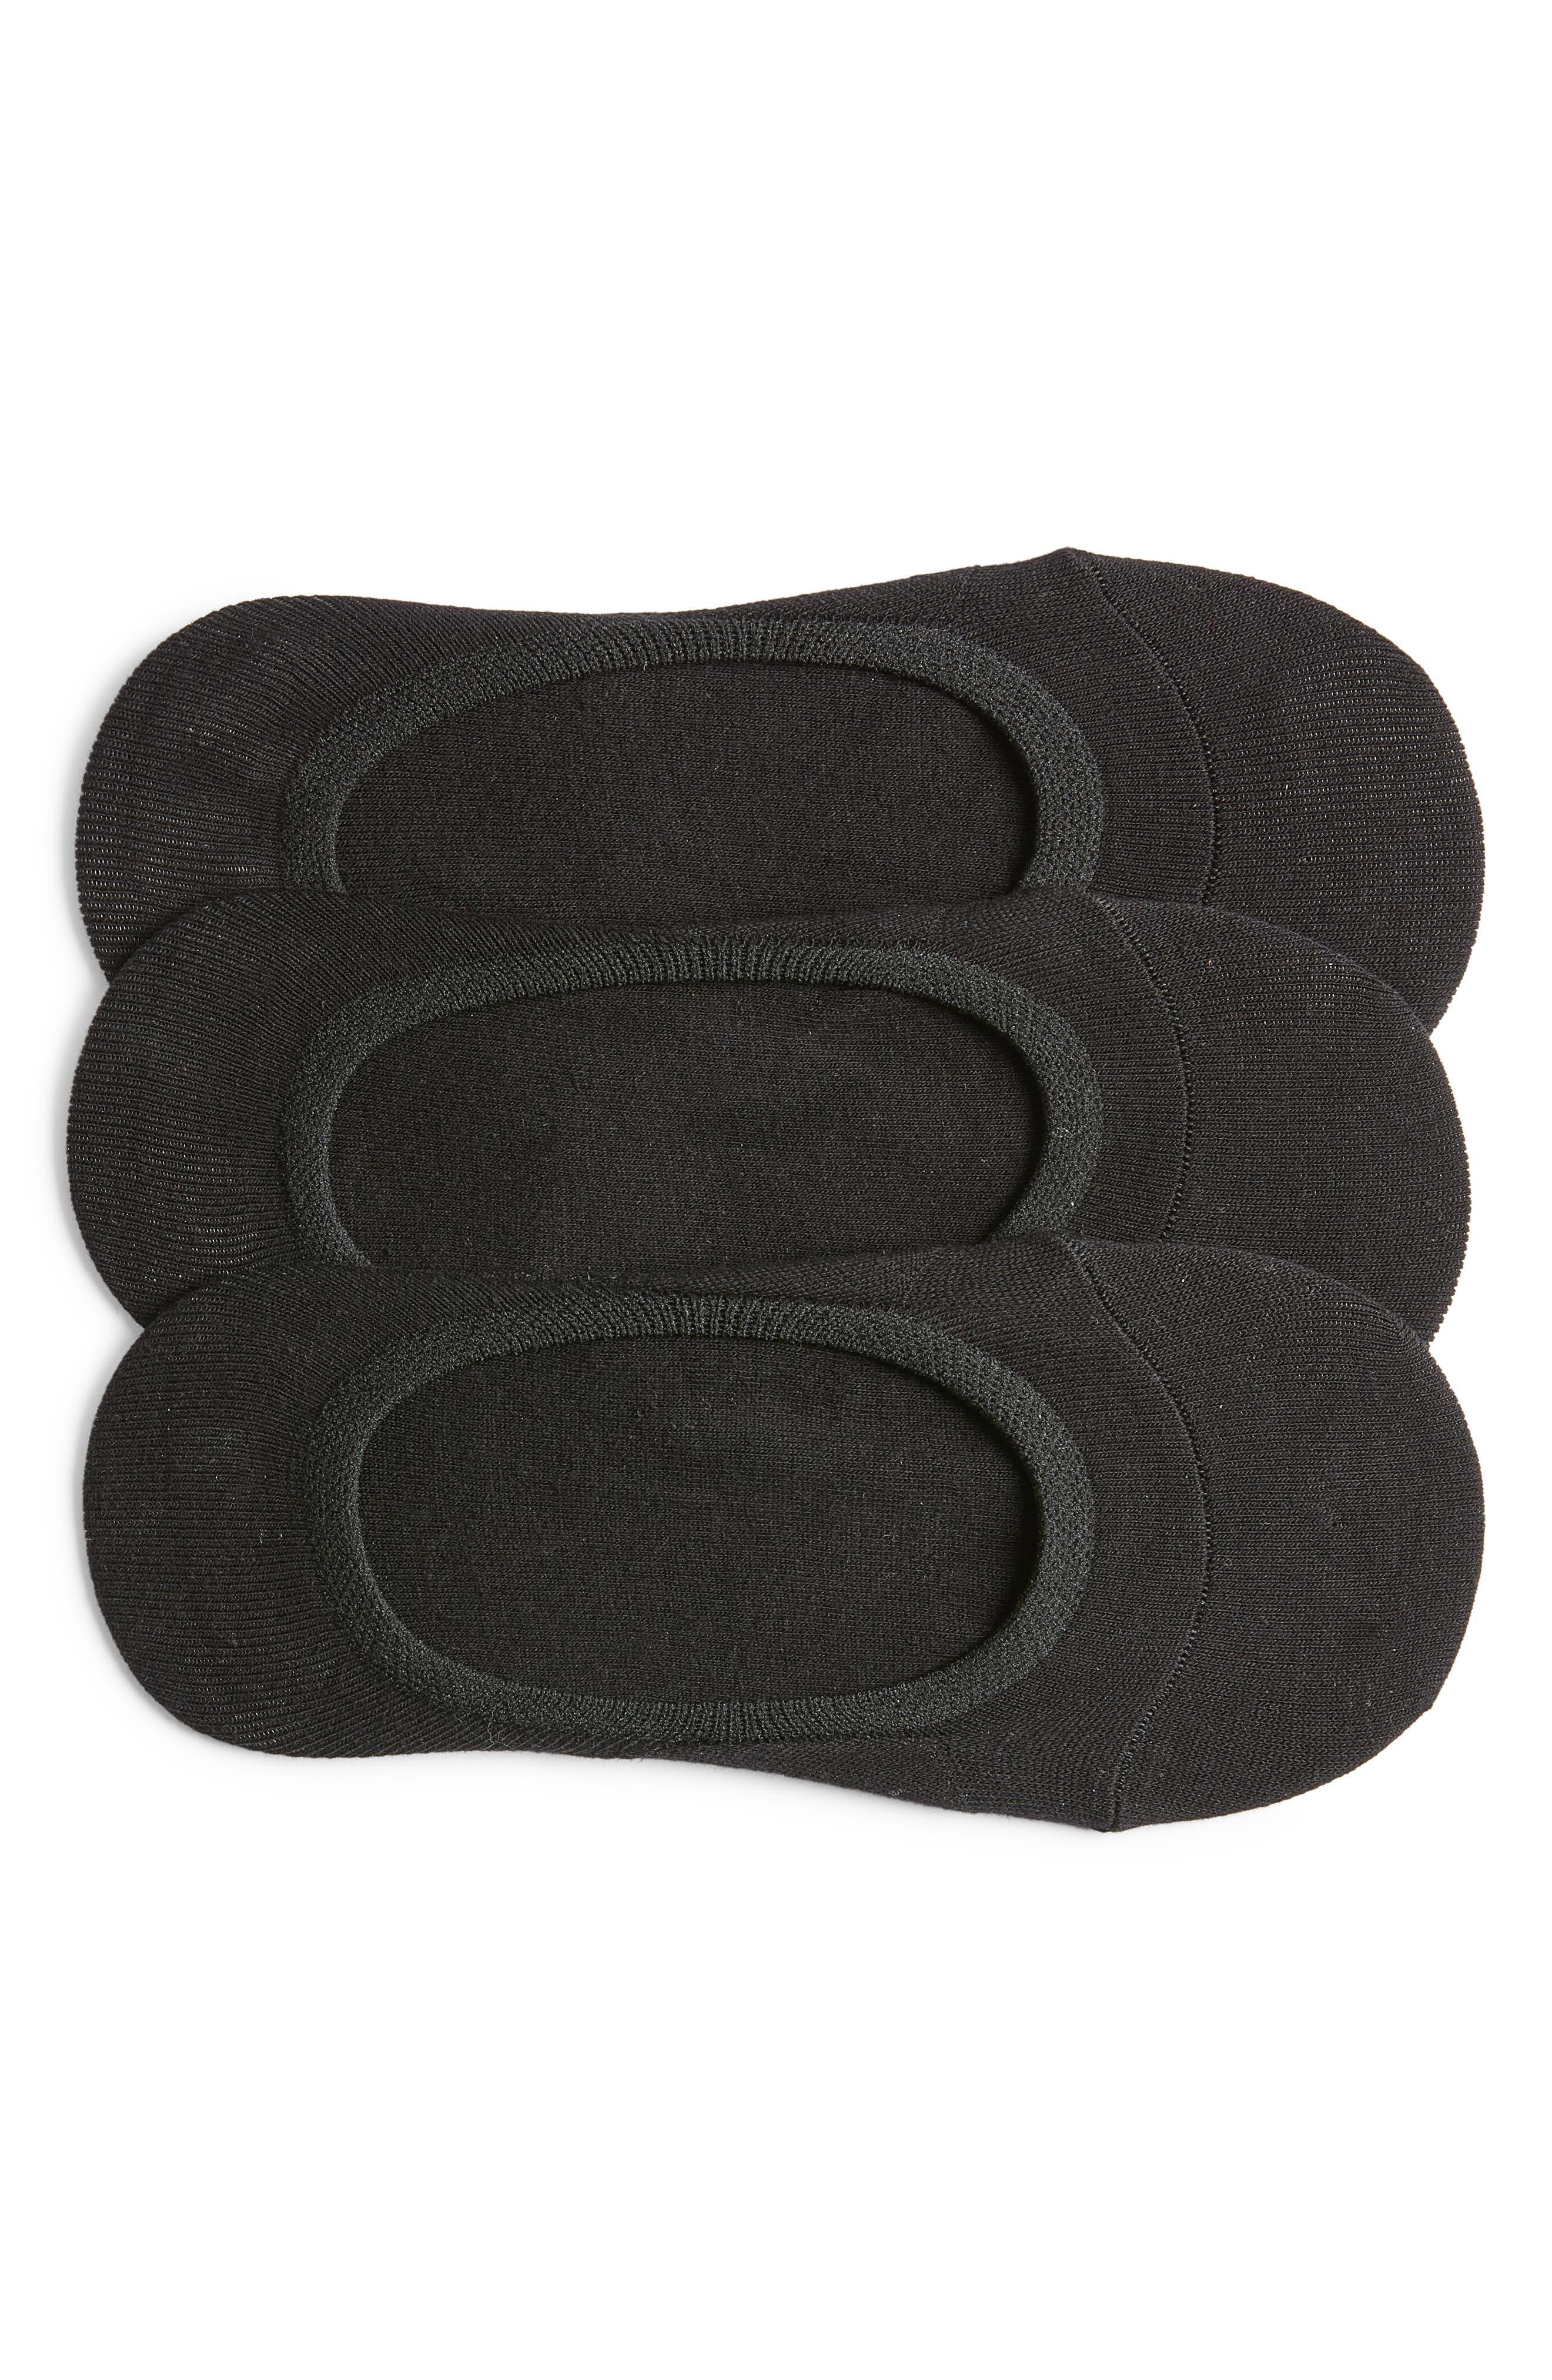 Image of Nordstrom No Show Socks - Pack of 3